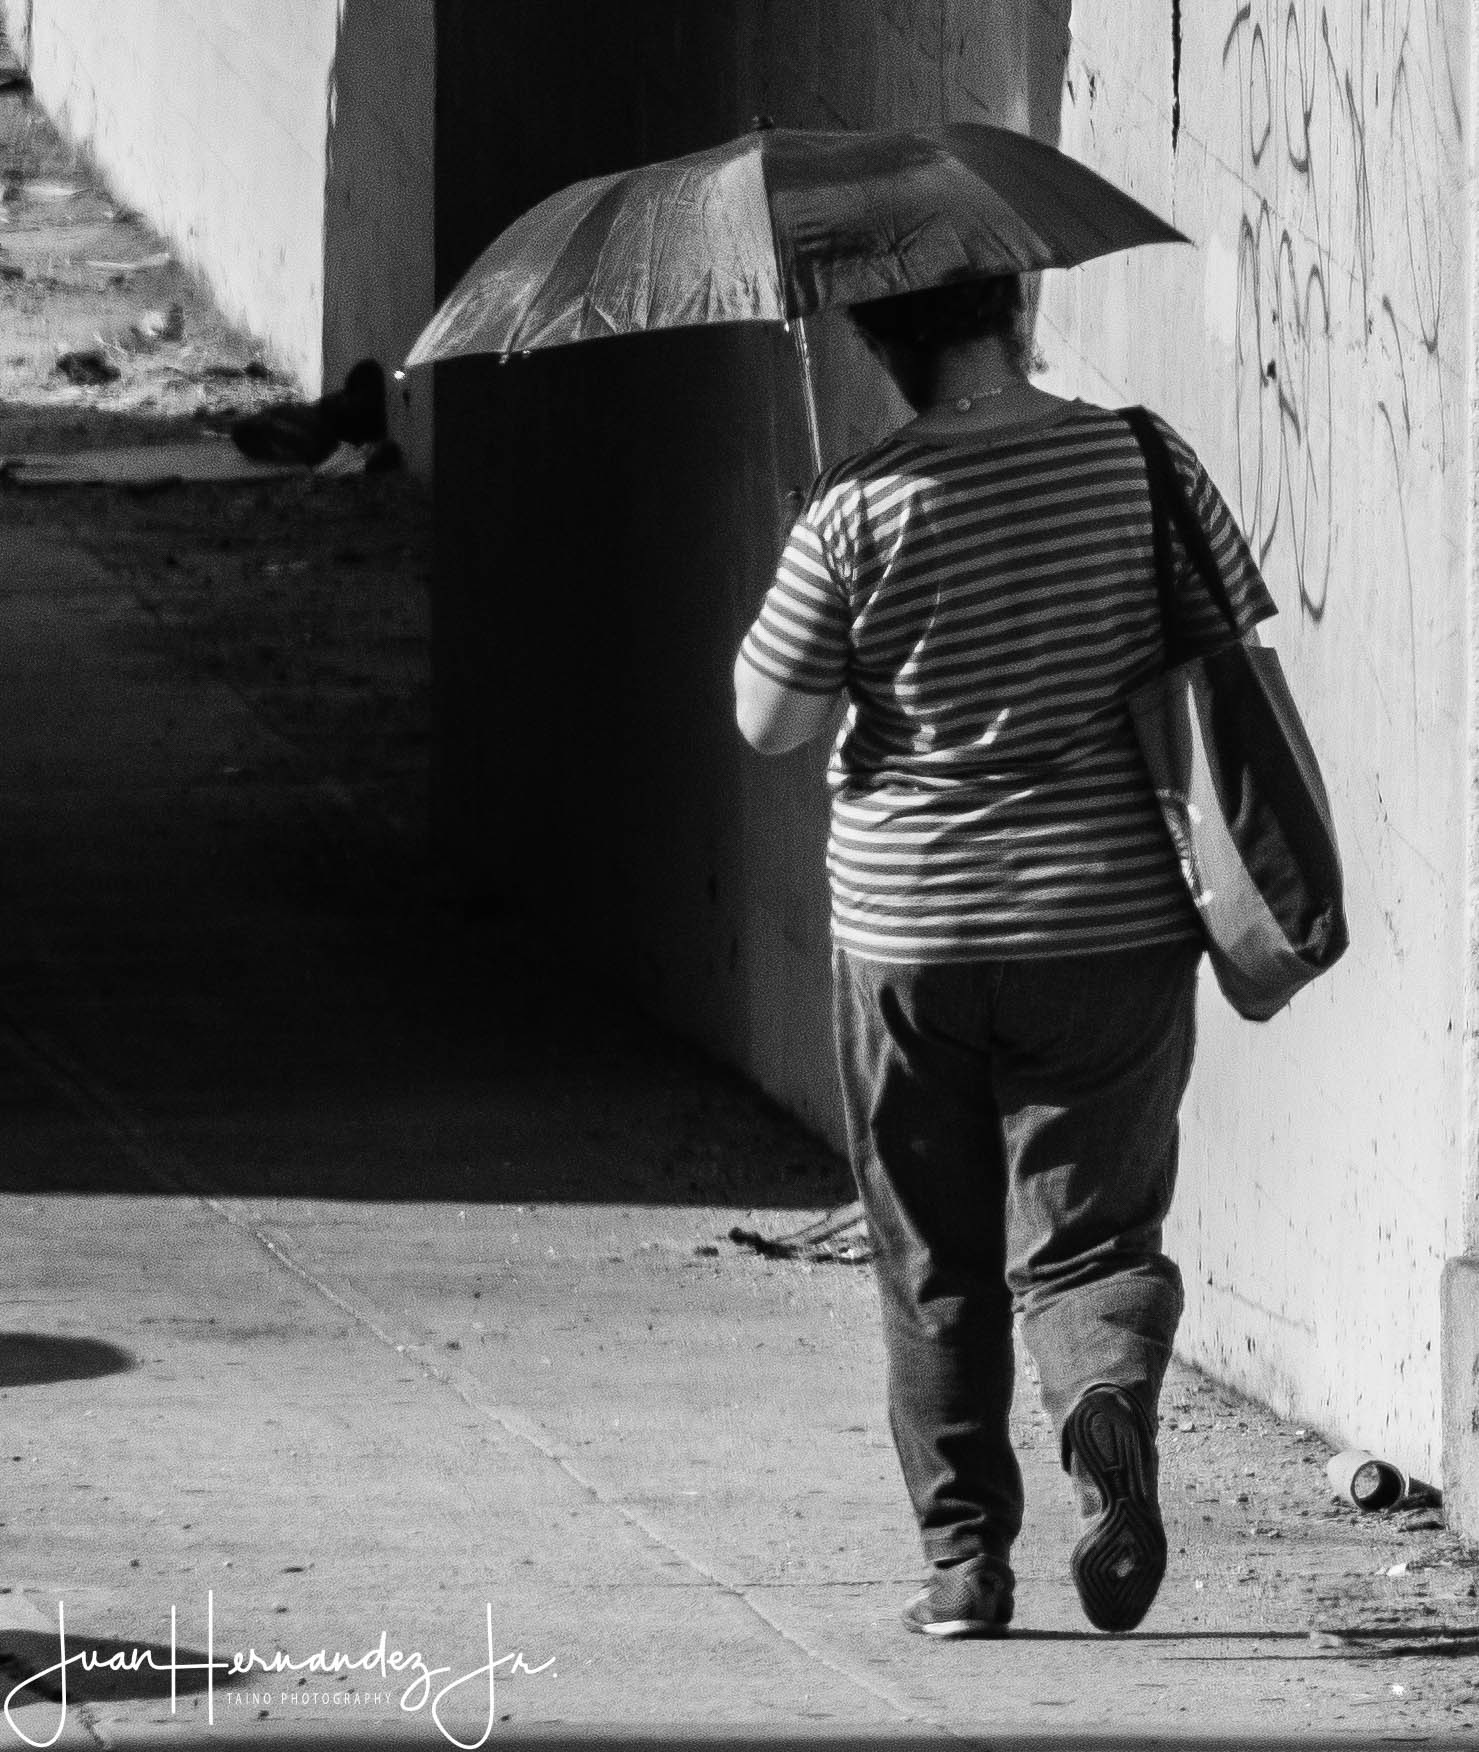 """The Long Walk Home"" by Juan Hernandez Jr."